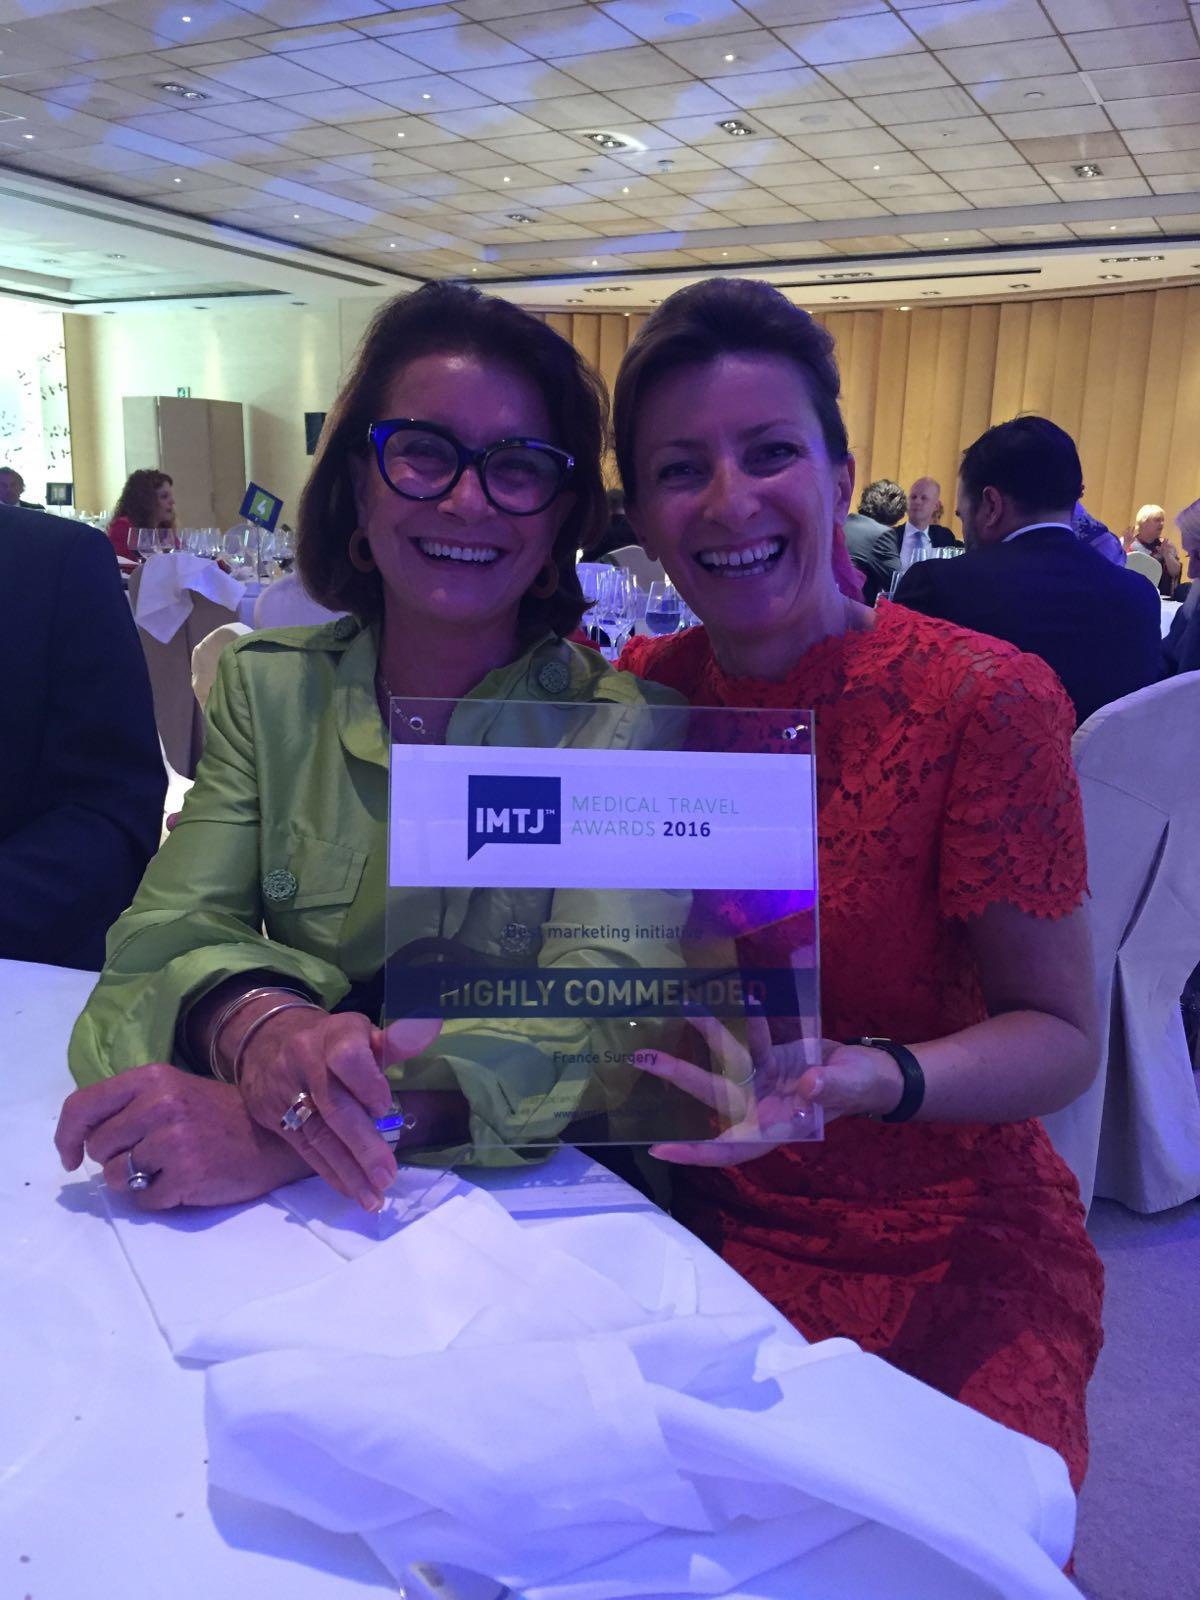 France Surgery wins again at IMTJ Medical Travel Awards